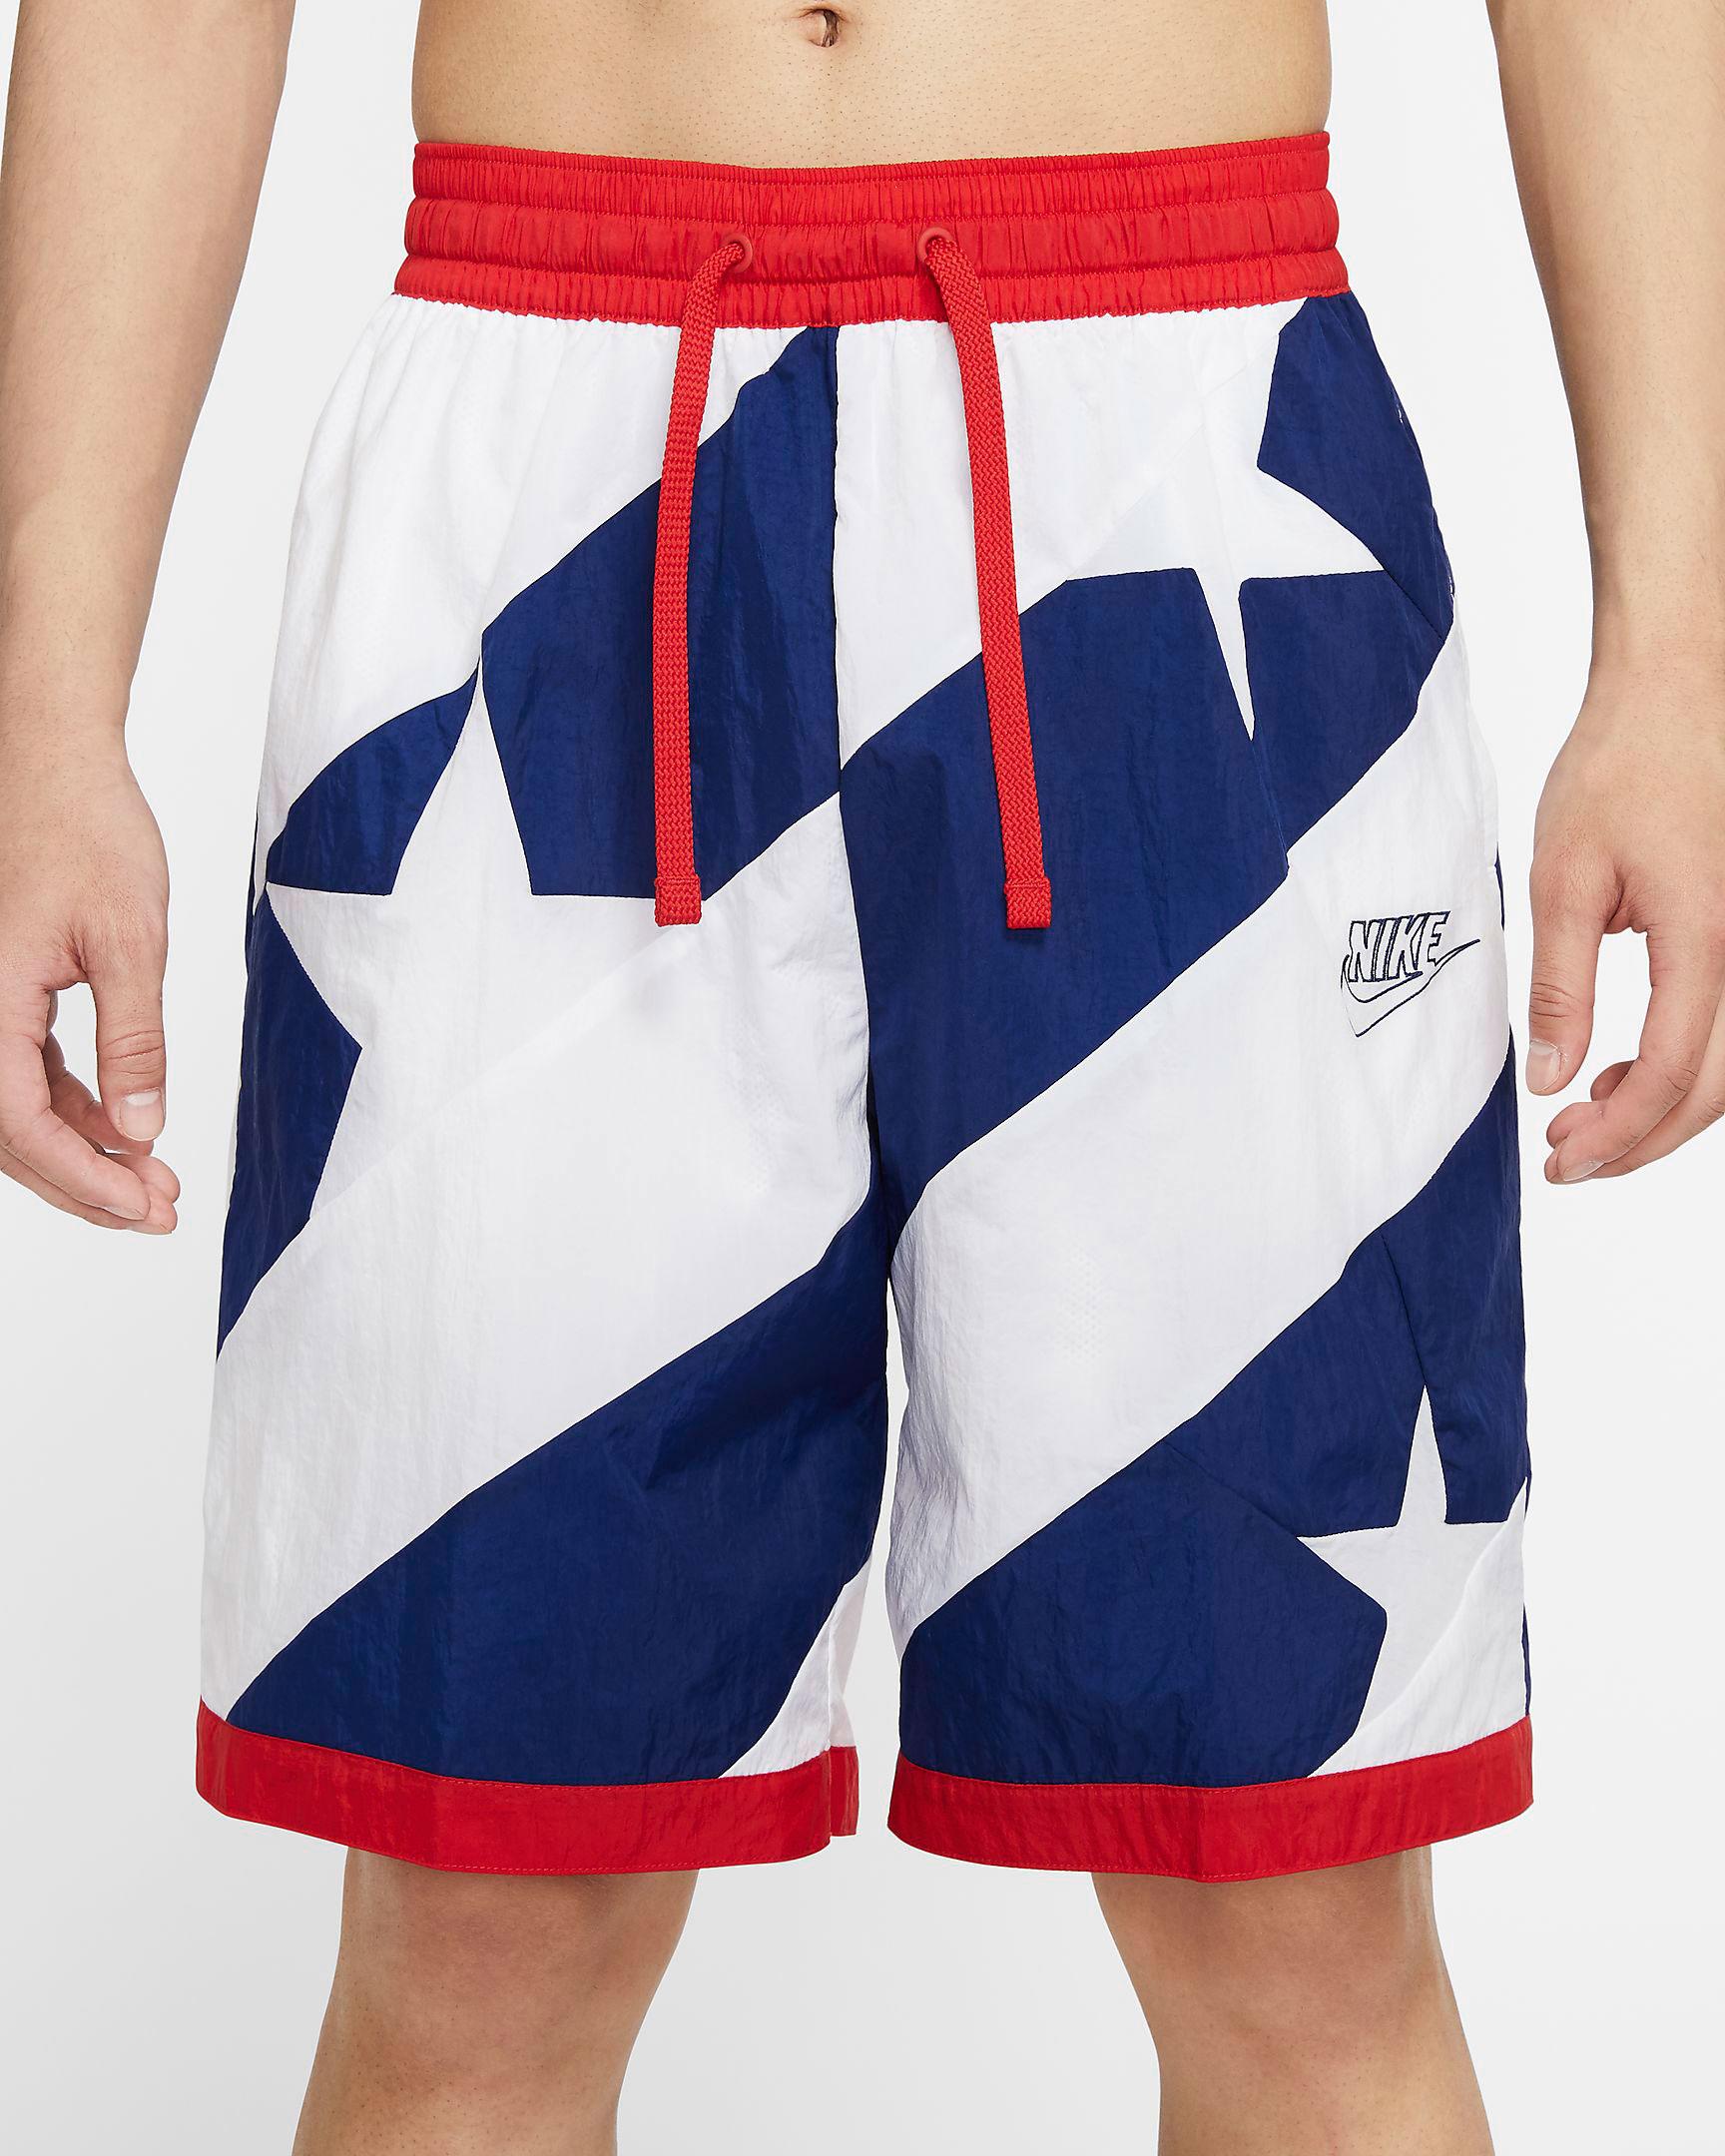 nike-lebron-17-graffiti-fire-red-cold-blue-matching-shorts